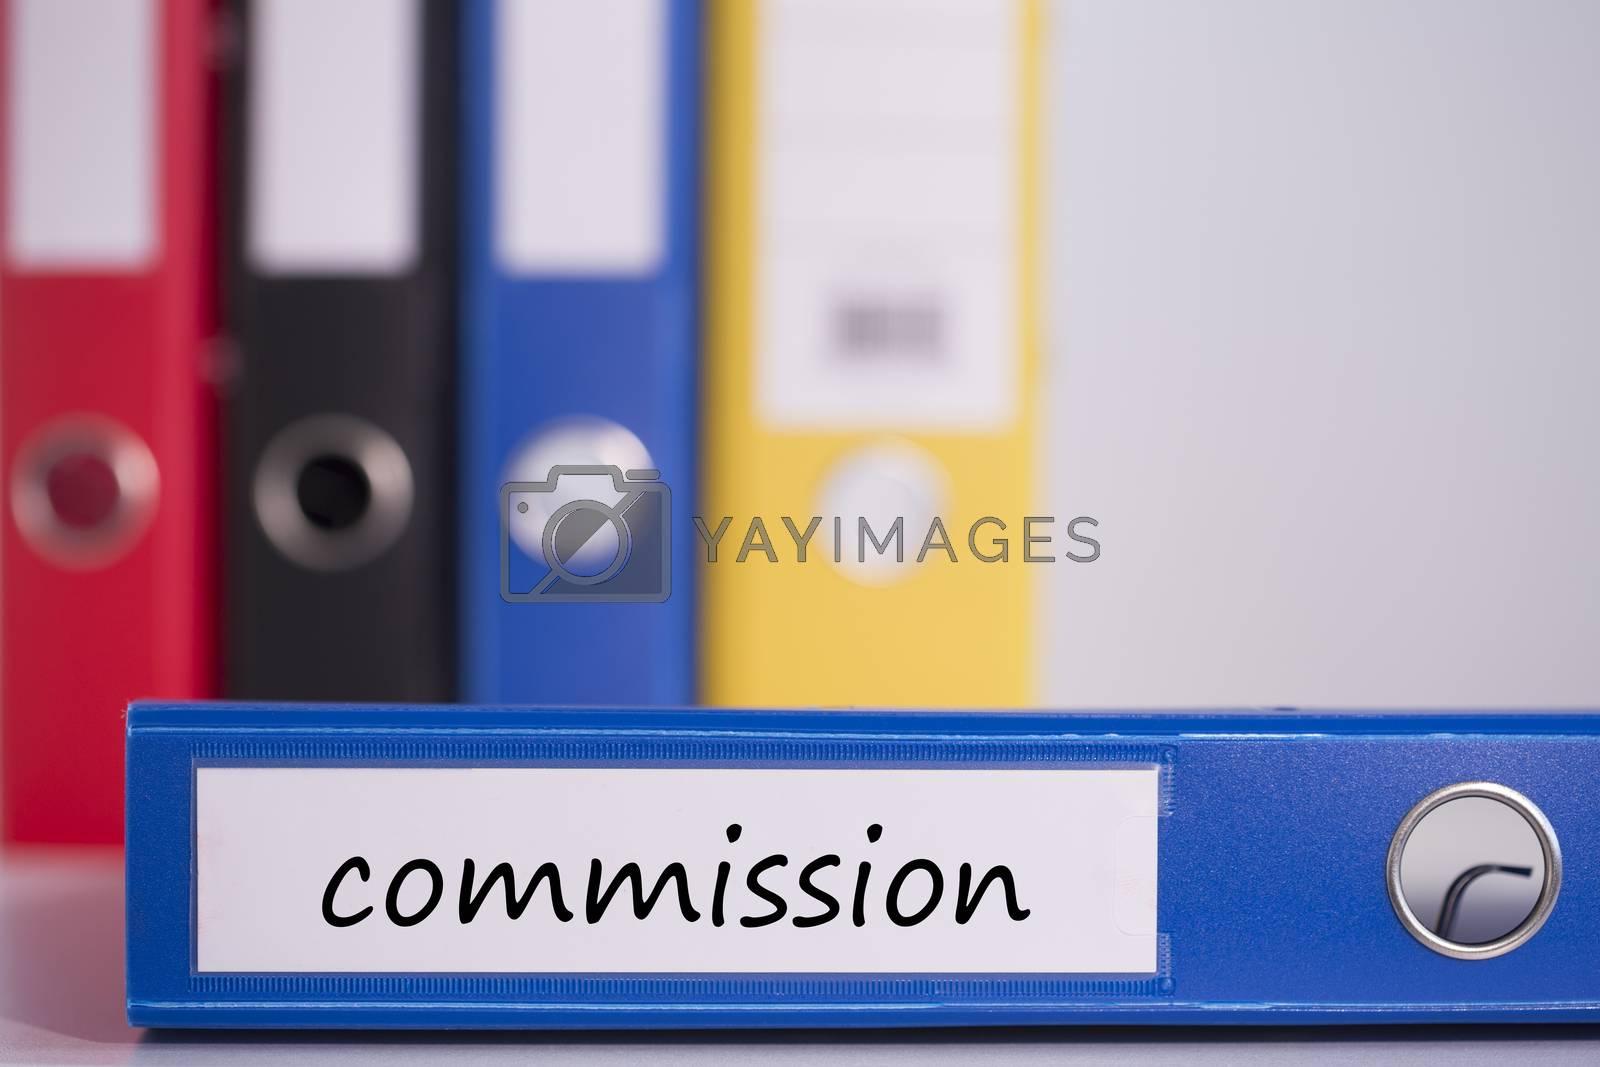 Commission on blue business binder by Wavebreakmedia